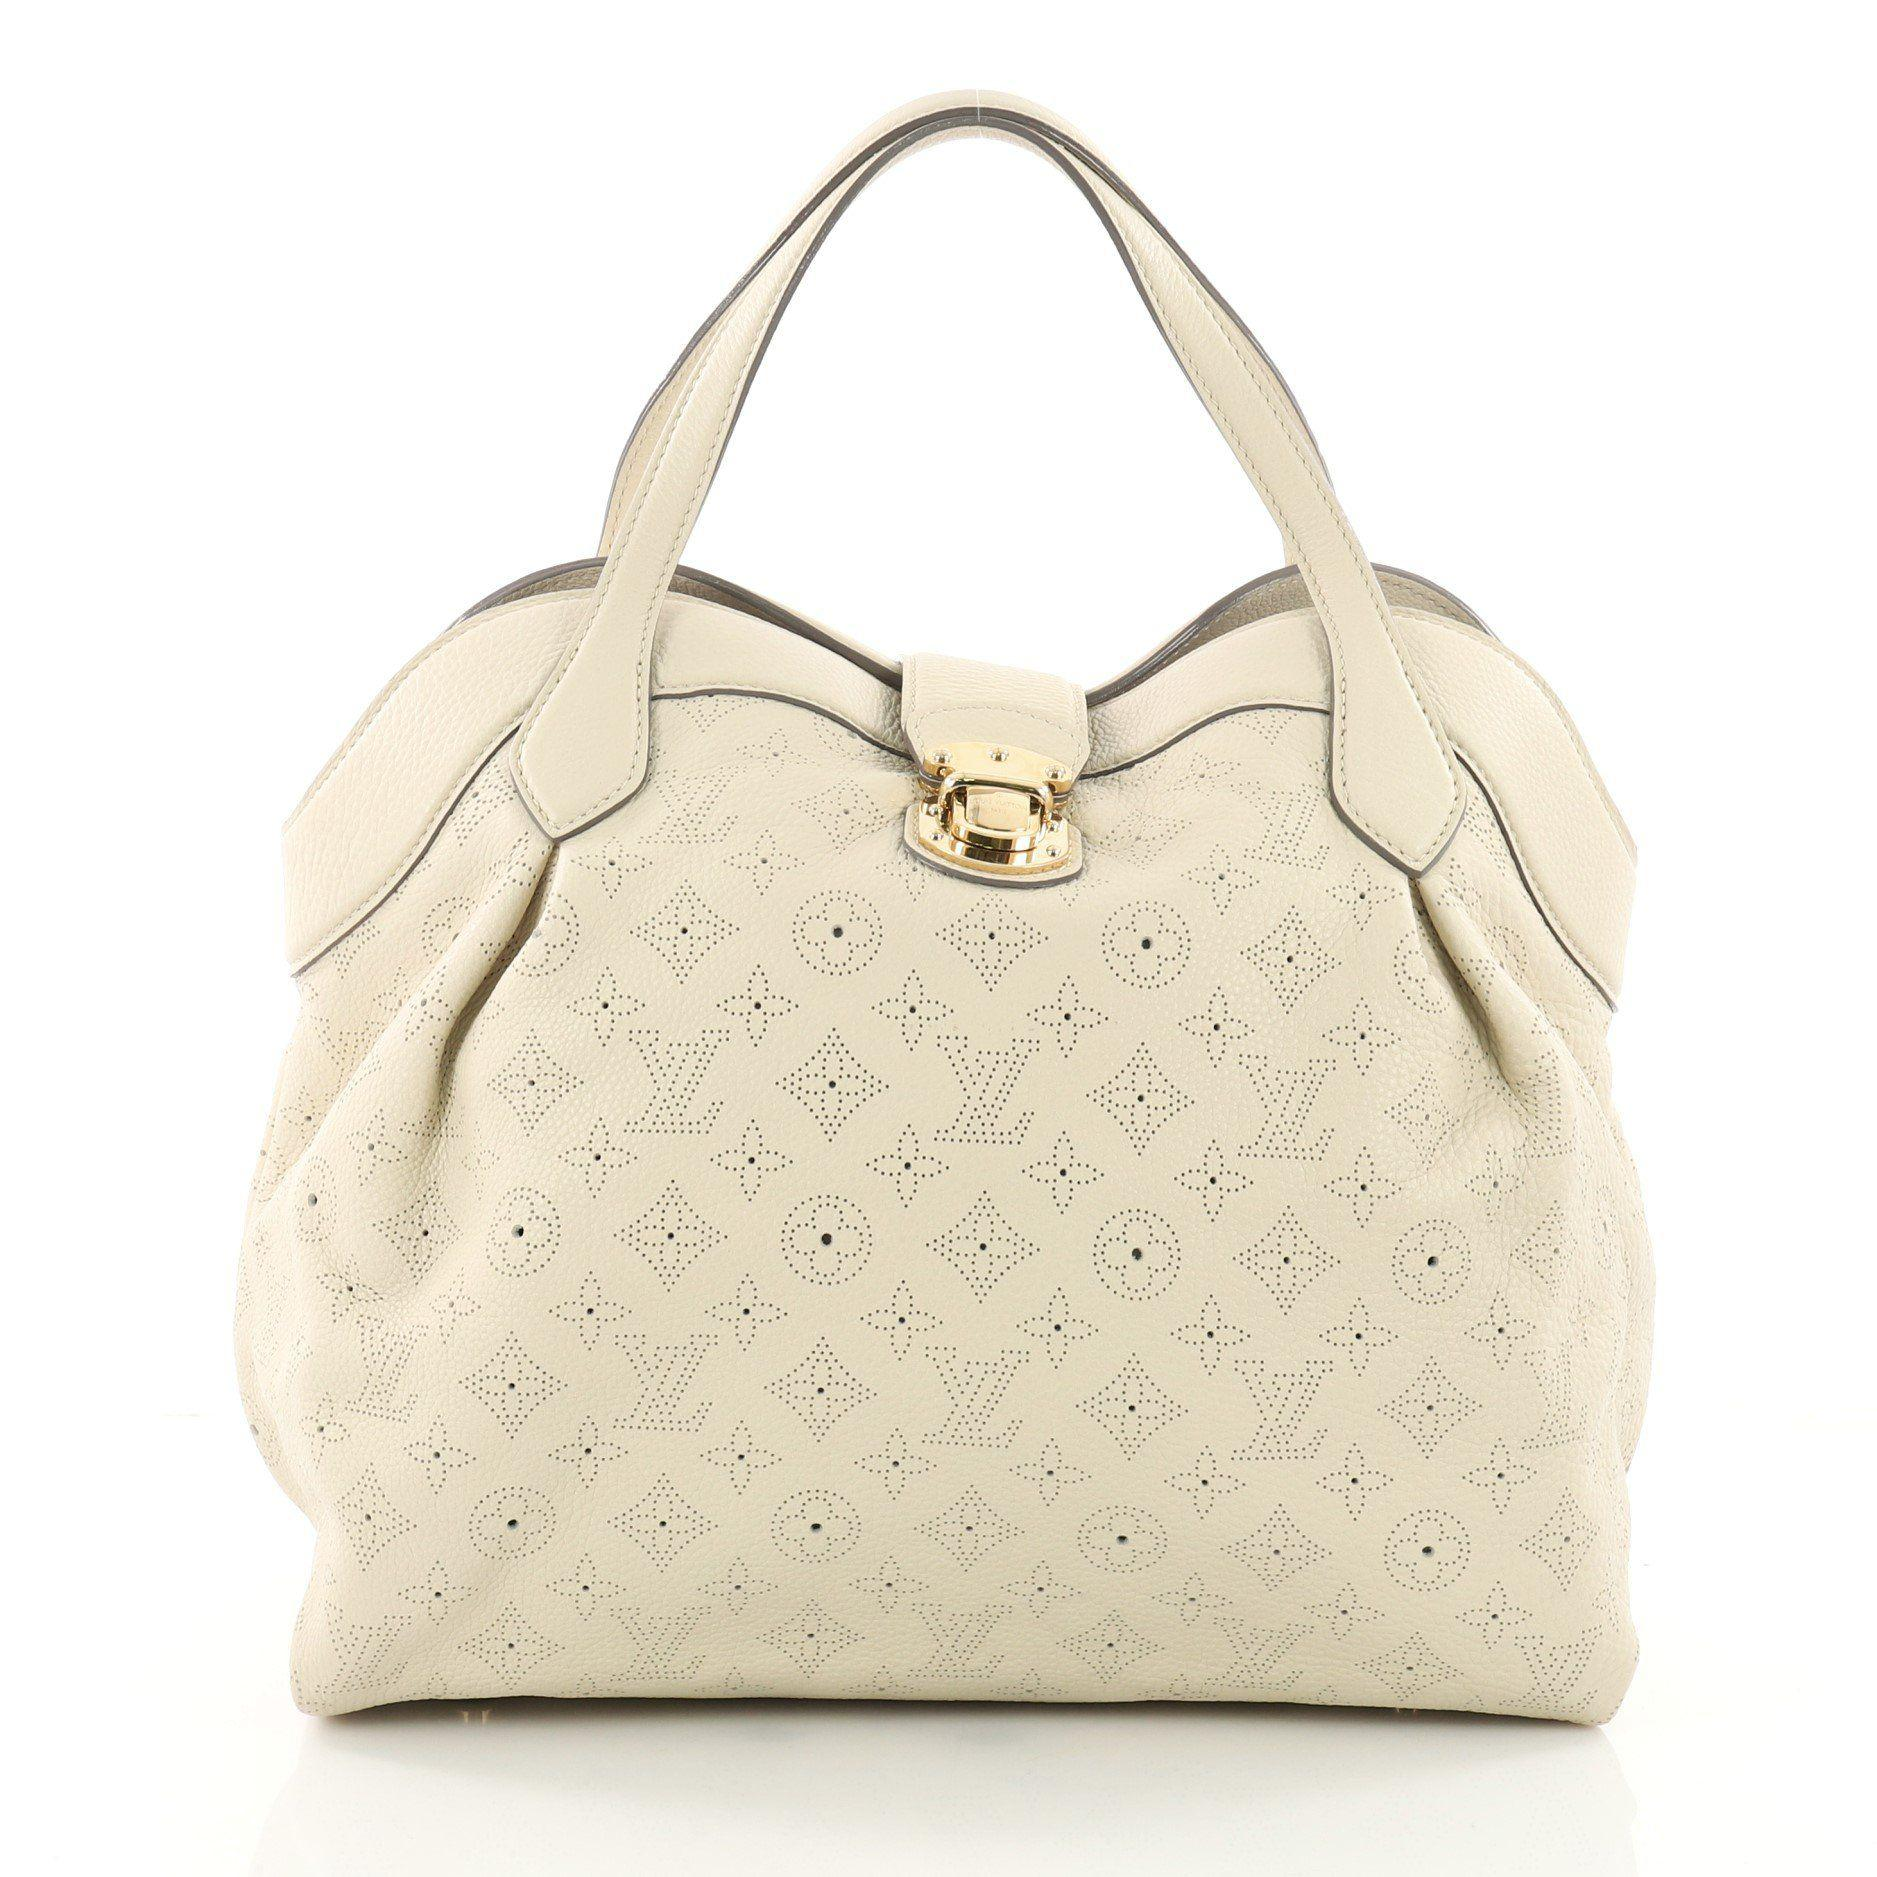 Lyst - Louis Vuitton Cirrus Handbag Mahina Leather Mm in Natural 0167898326a6b